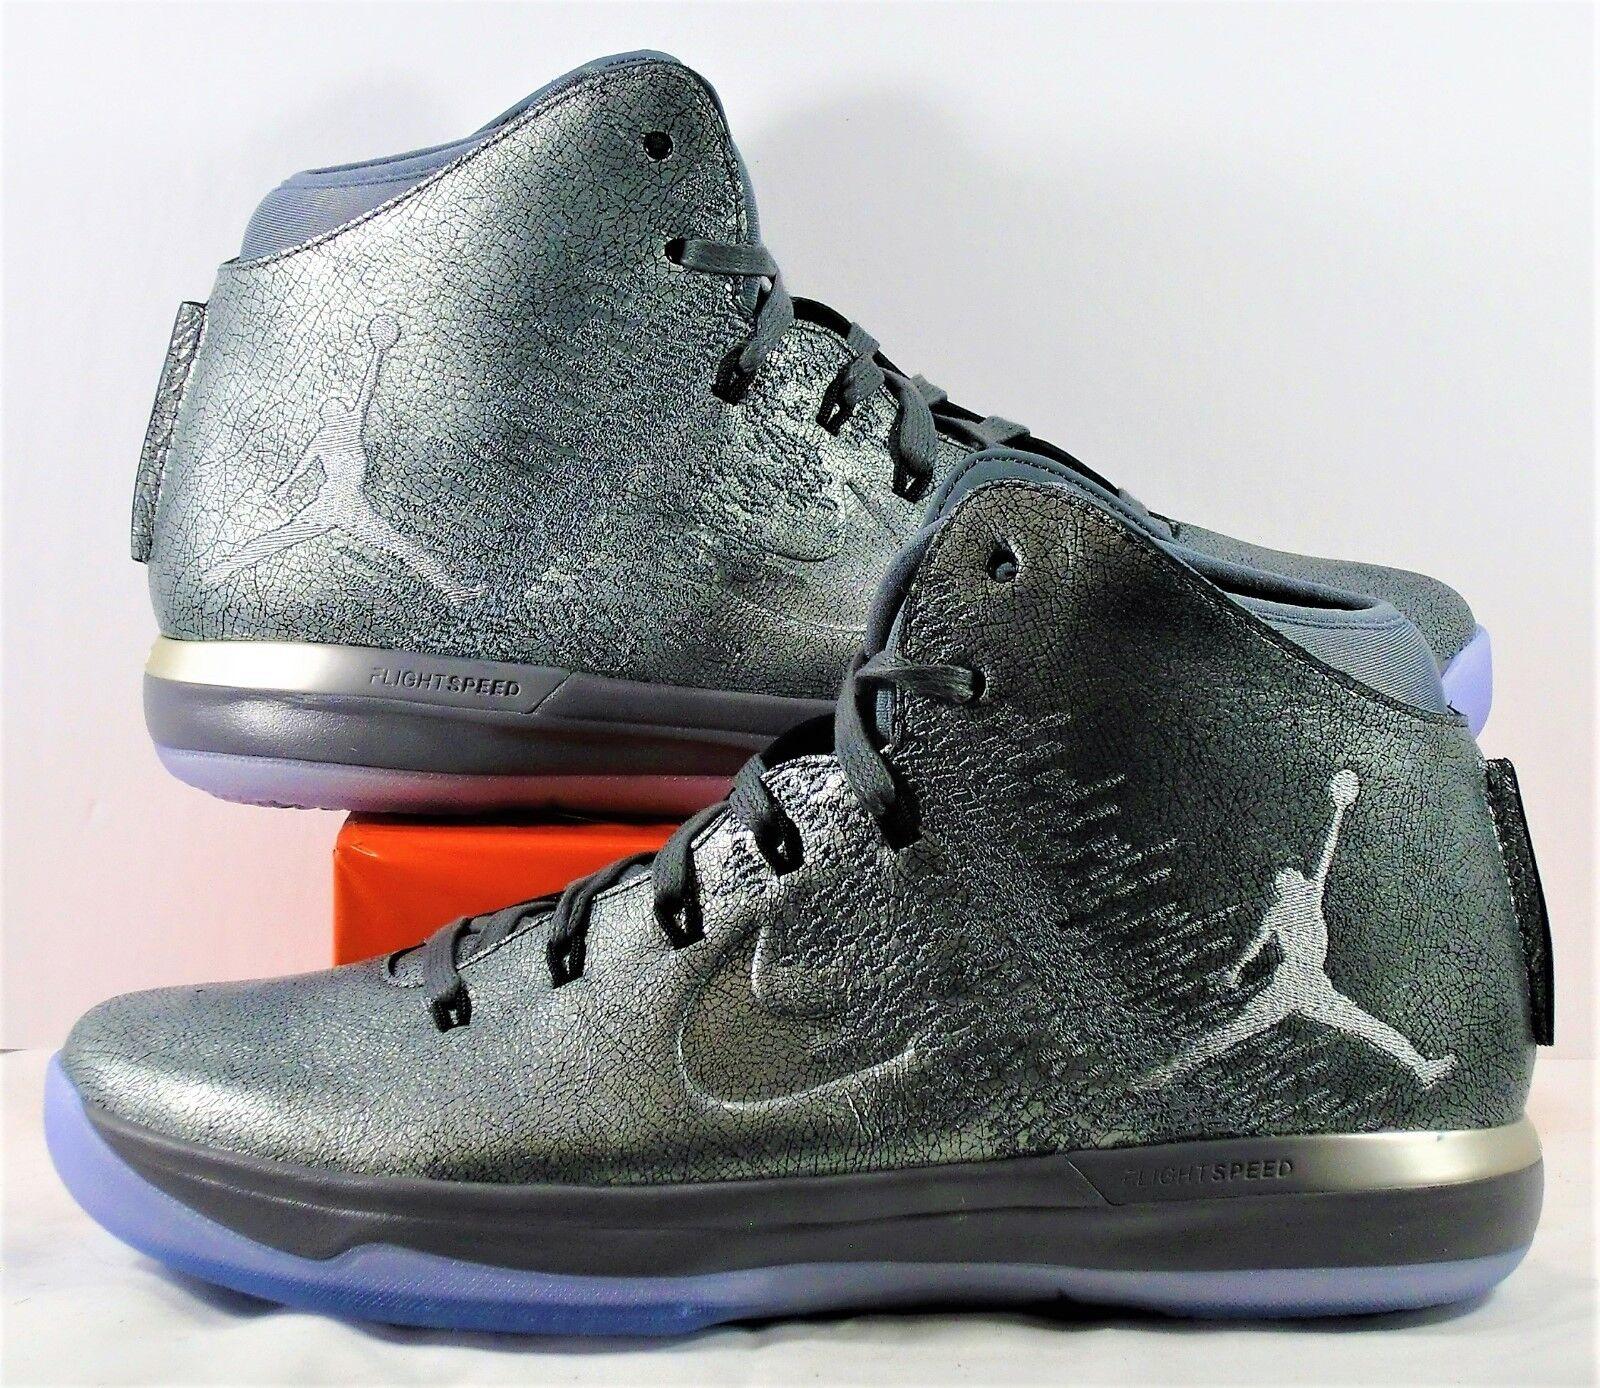 Nike Air Jordan XXXI 31 PRM Battle Cool Grey & Wolf Grey Sz 8.5 NEW 914293 013 Brand discount